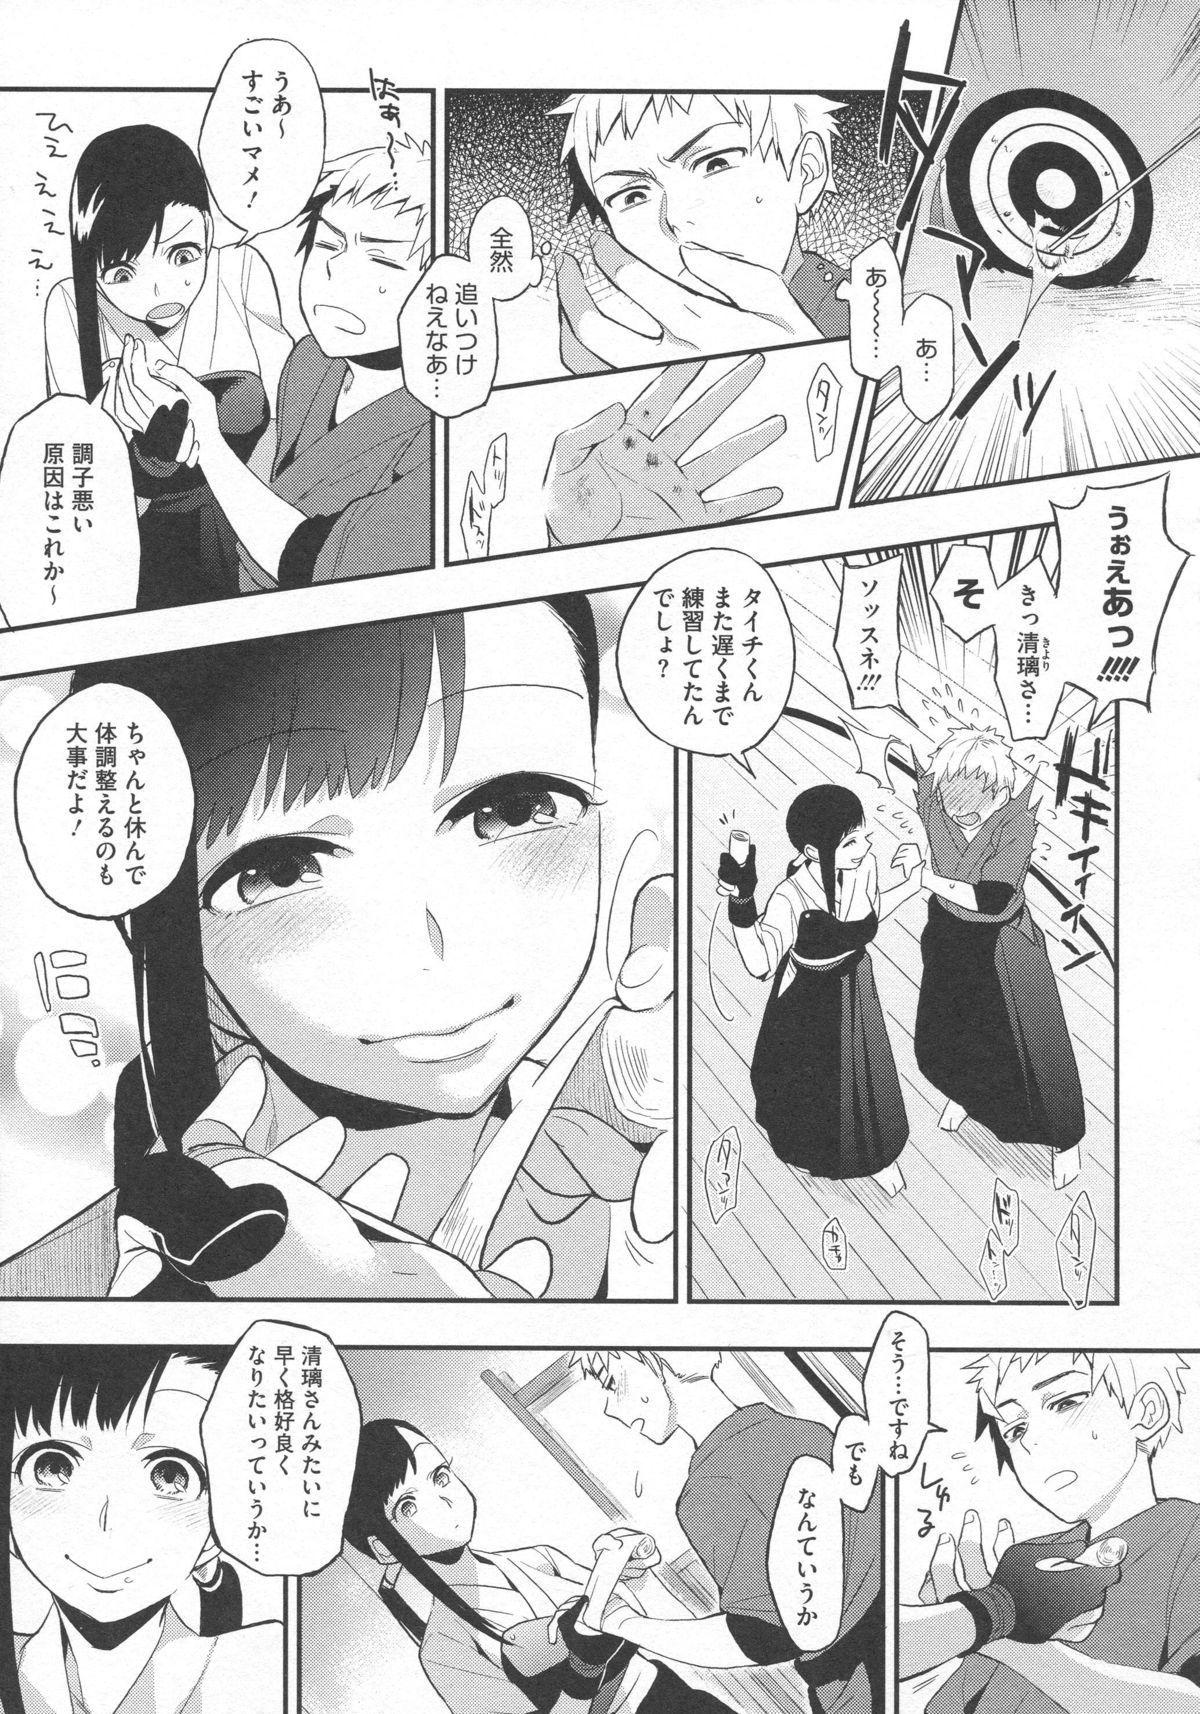 Boku Dake no Yuuyami - Only My Twilight 159